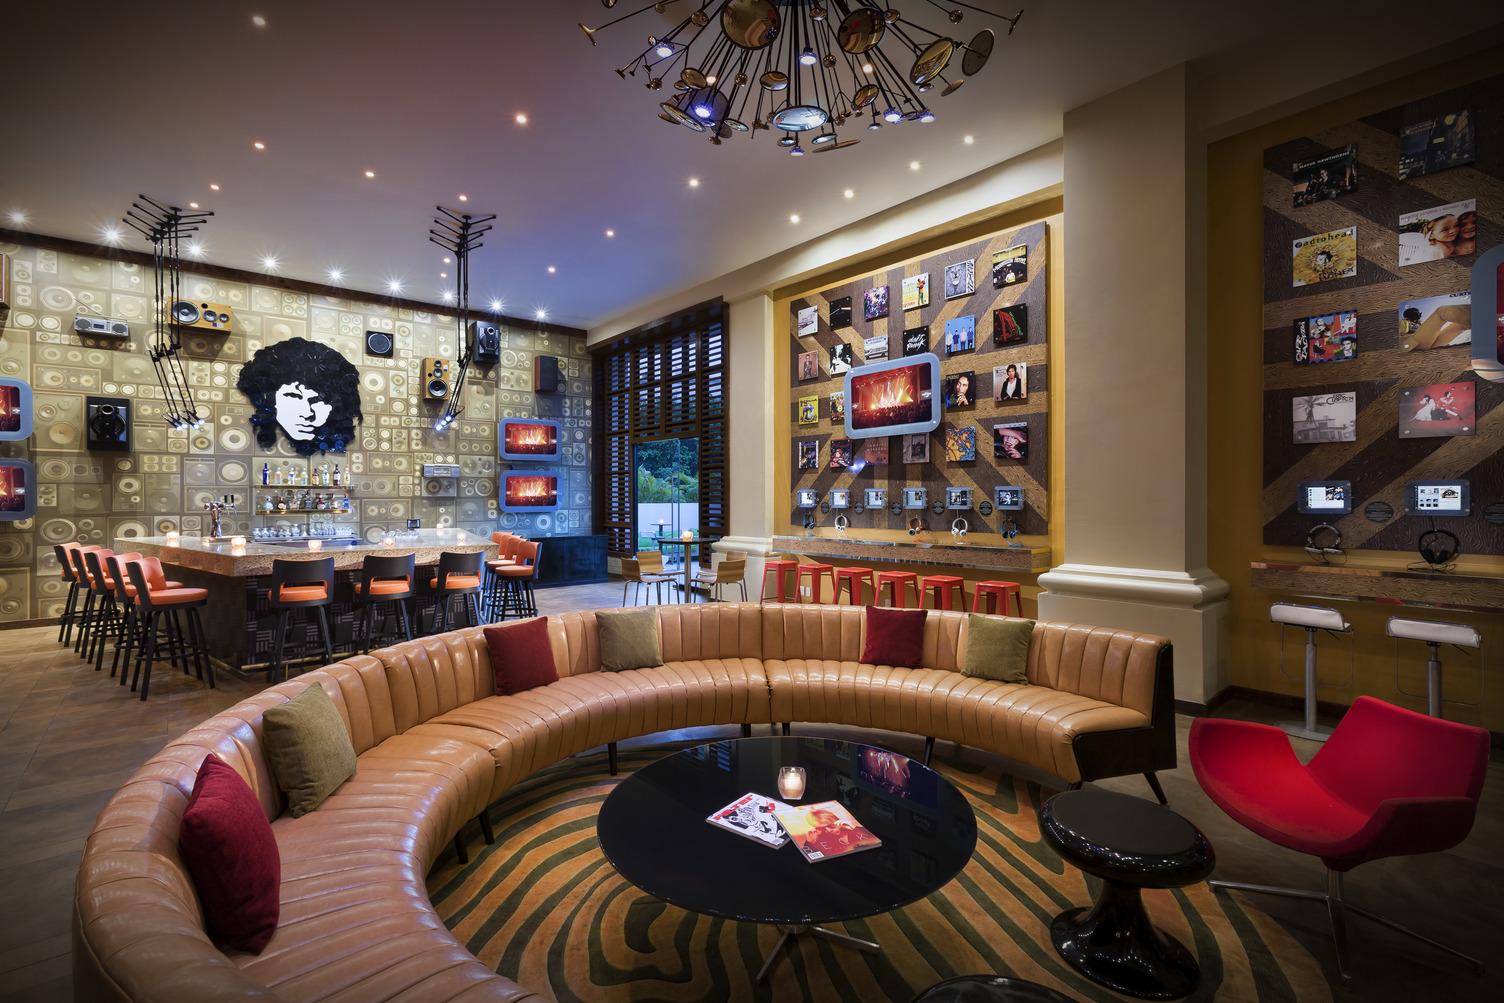 Travel Agency All-Inclusive Resort Heaven at Hard Rock Hotel Riviera Maya 52